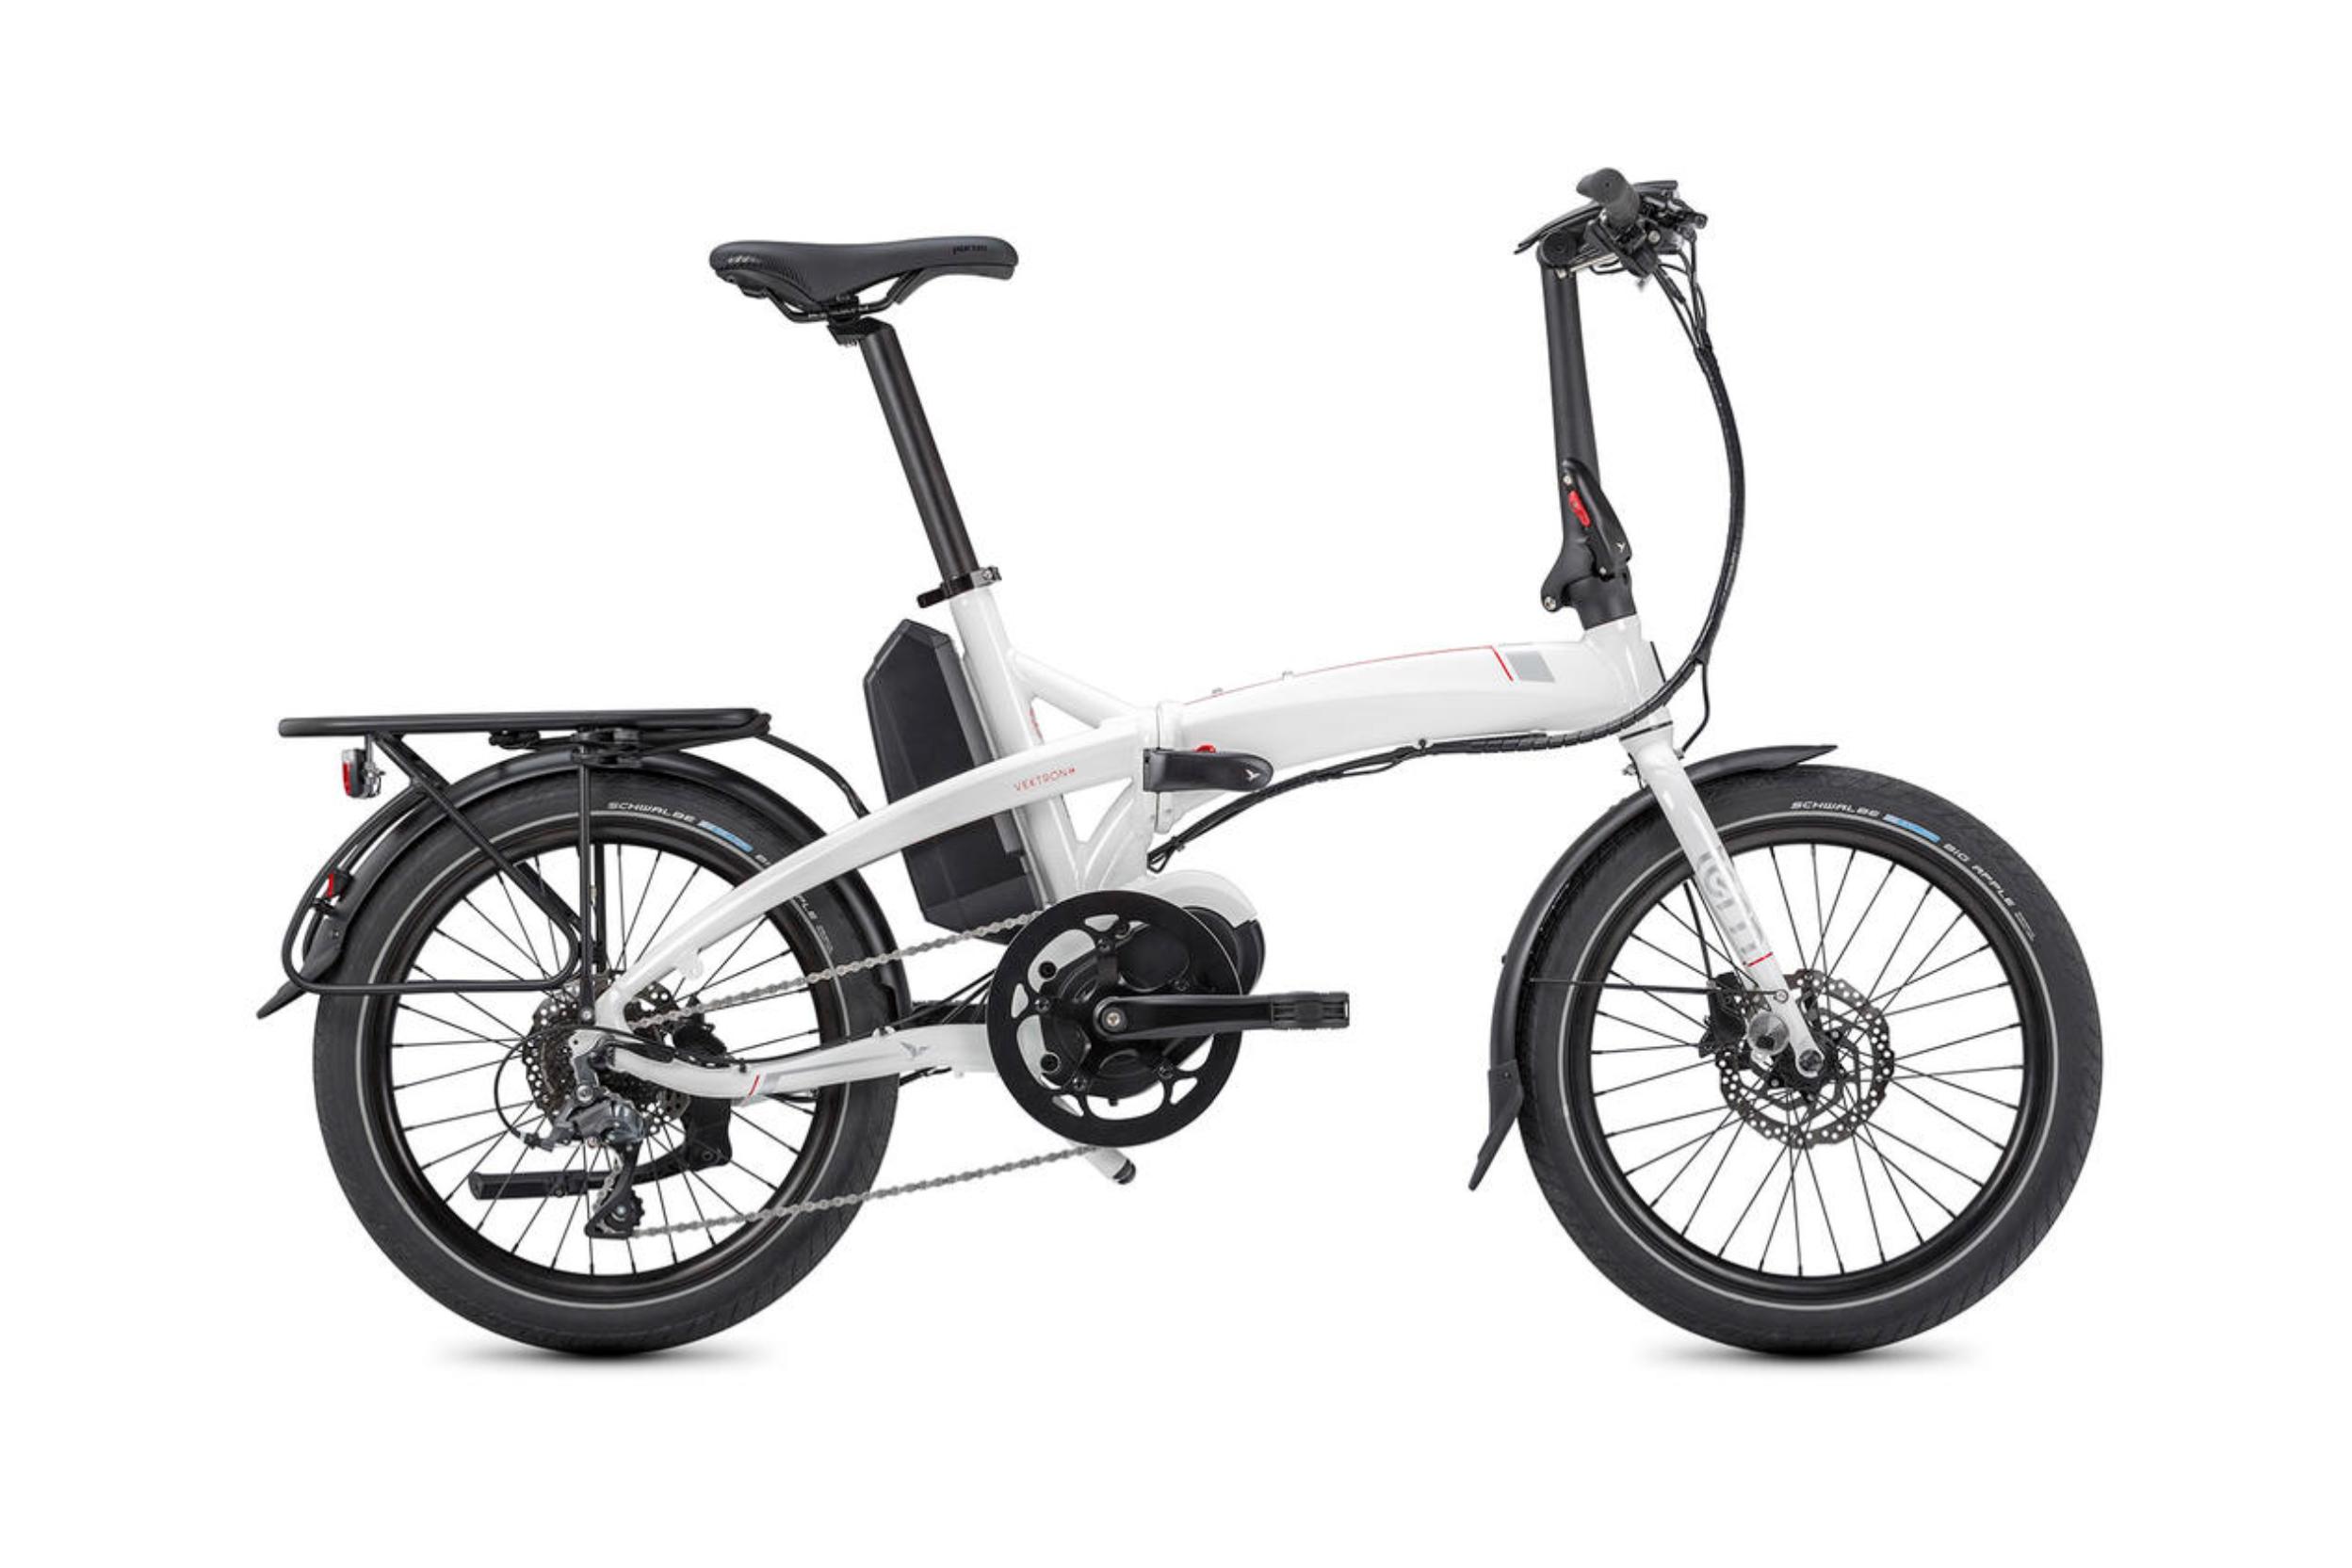 Tern Vektron D8 electric folding bike